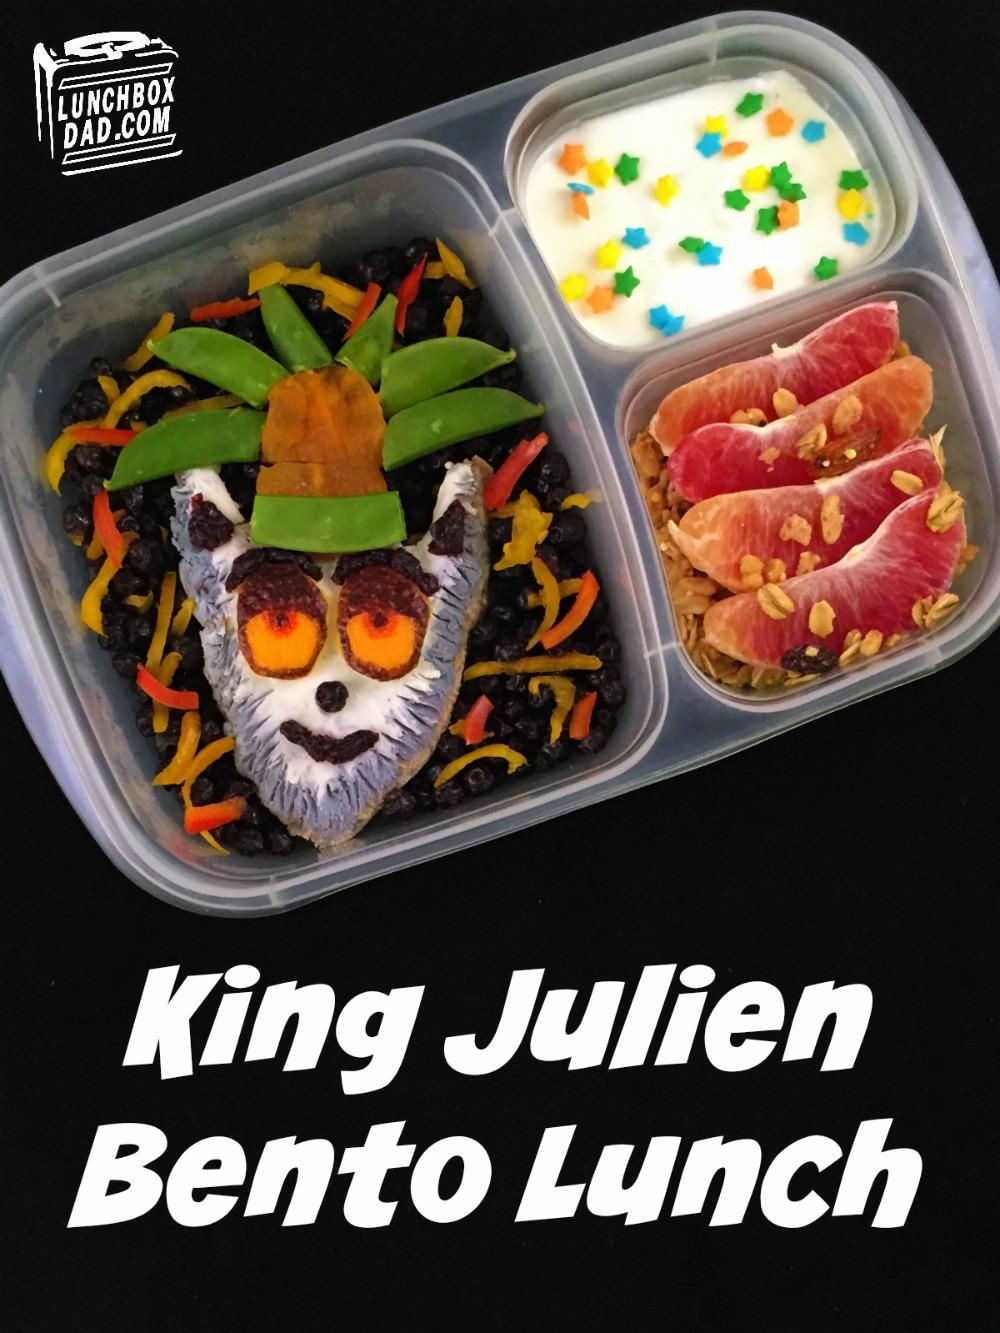 King Julien bento lunch Madagascar All Hail King Julien